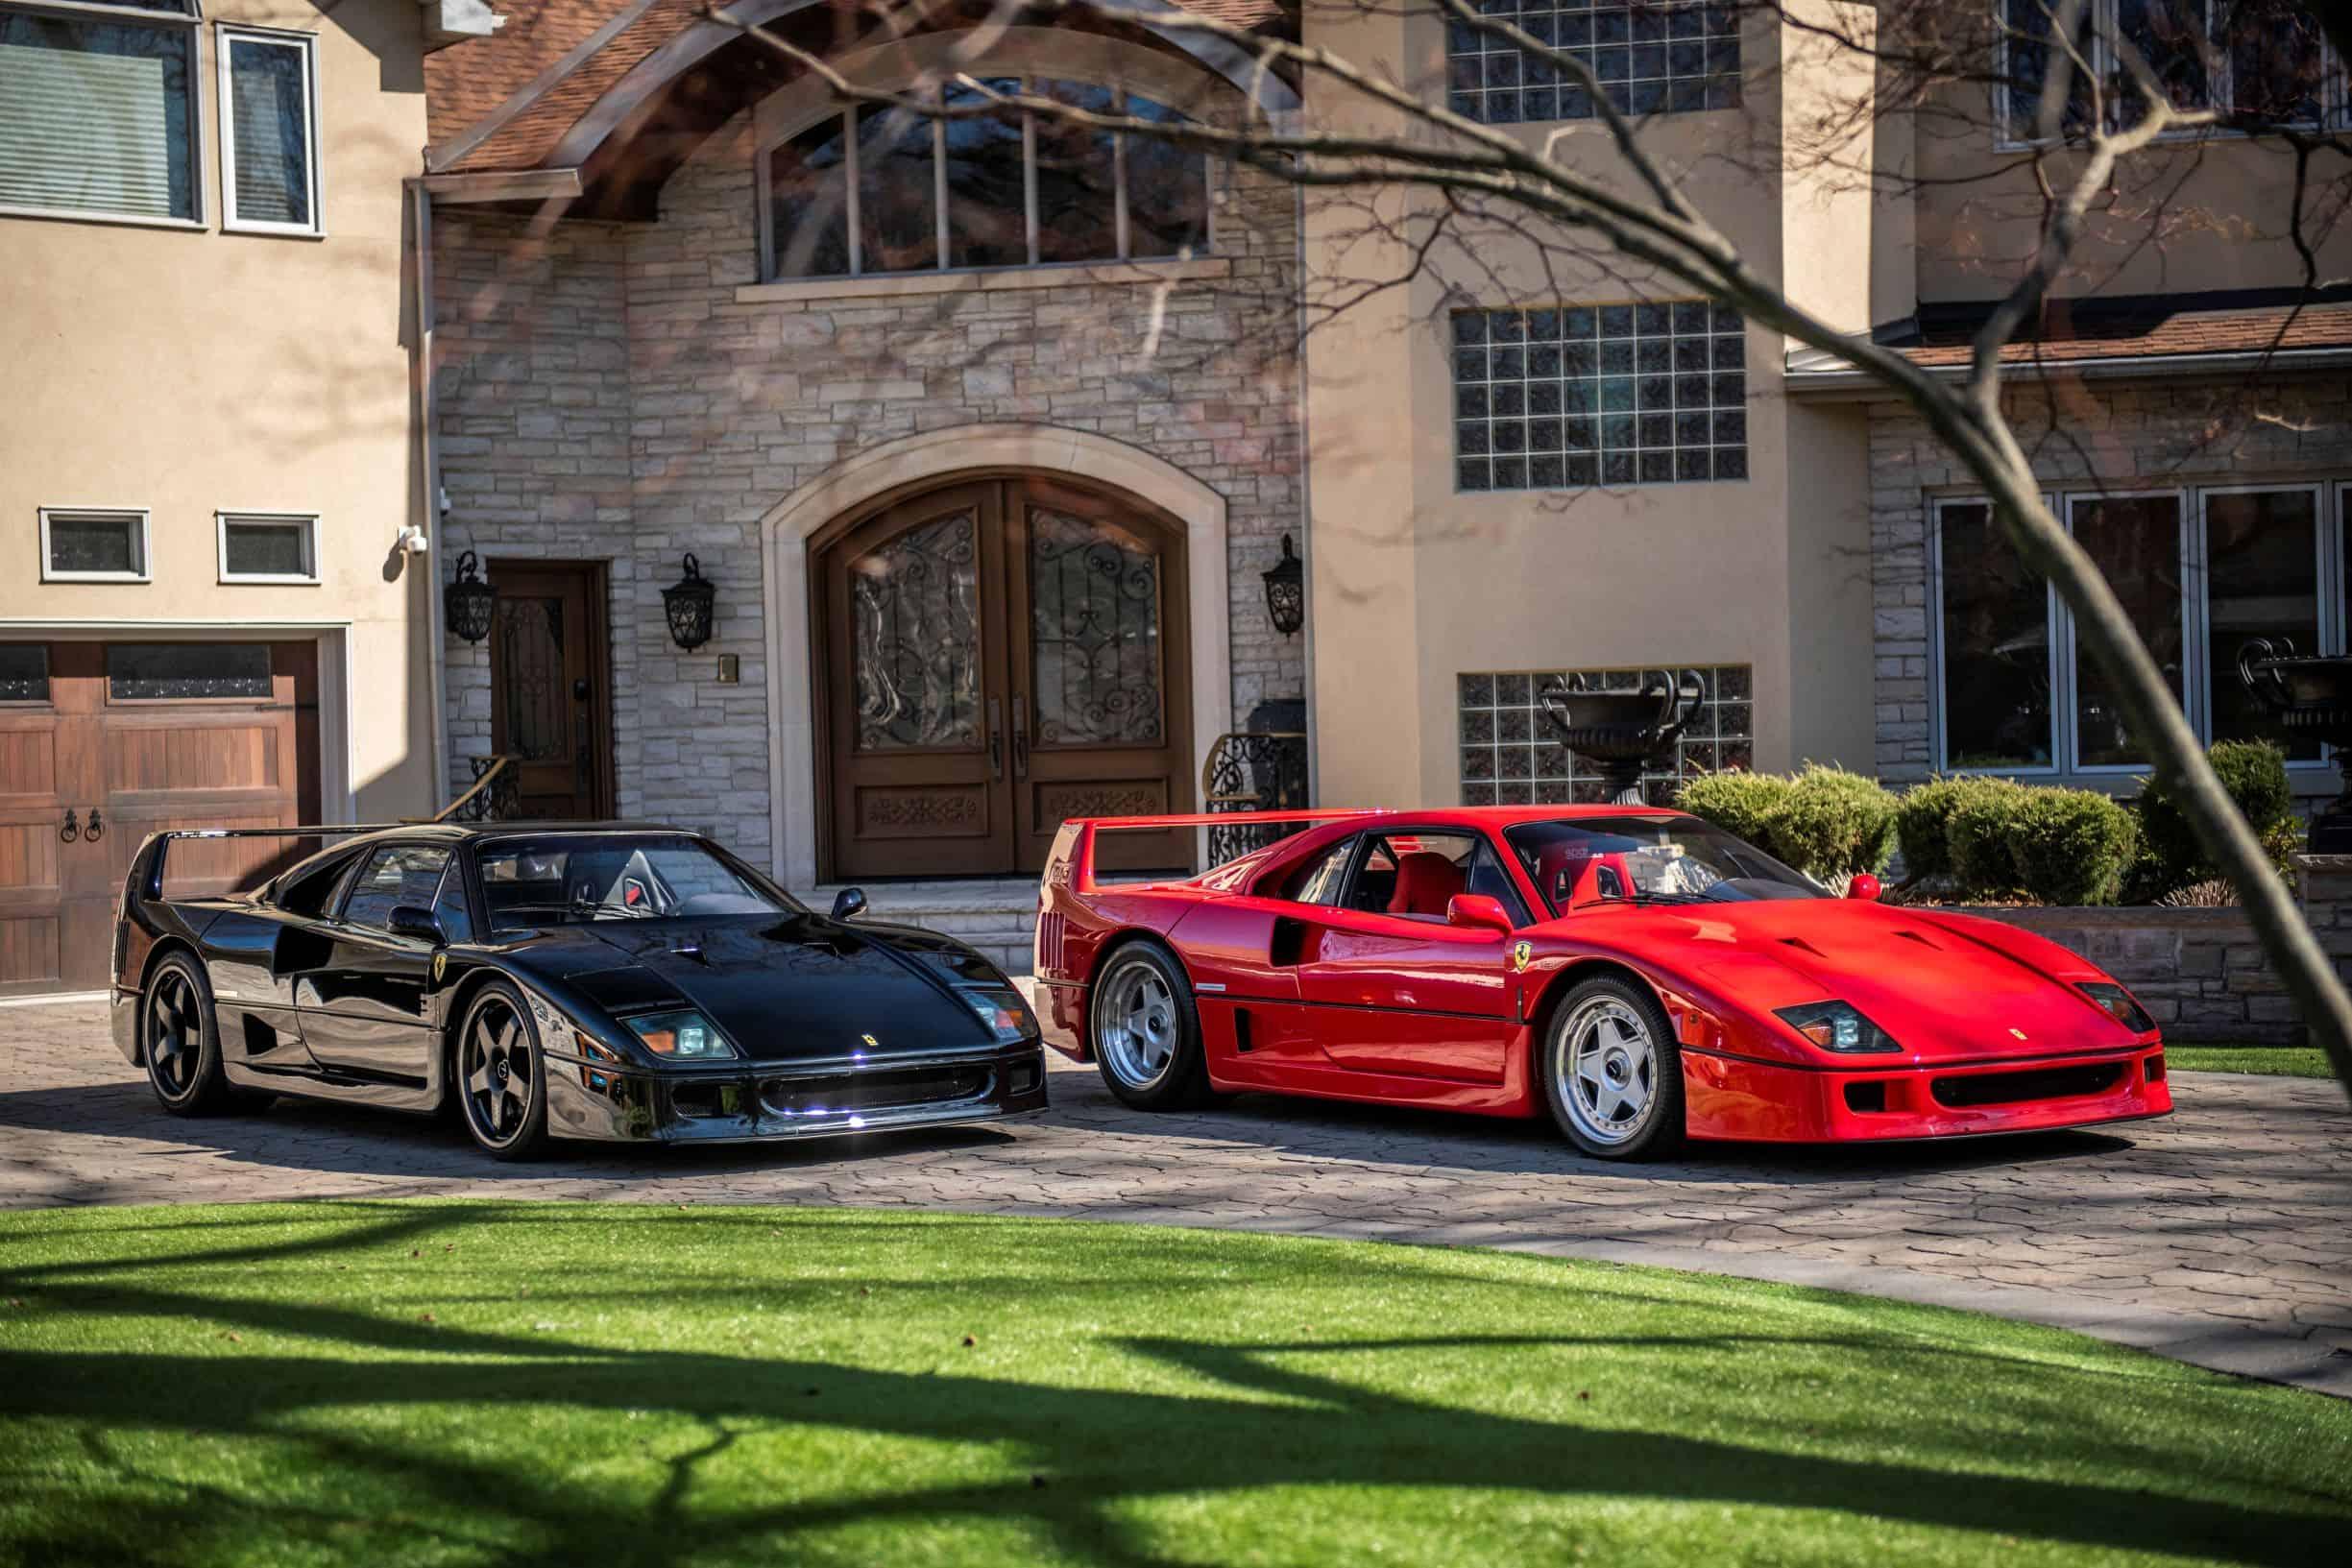 A pair of Ferrari F40s photographed Lucas Scarfone